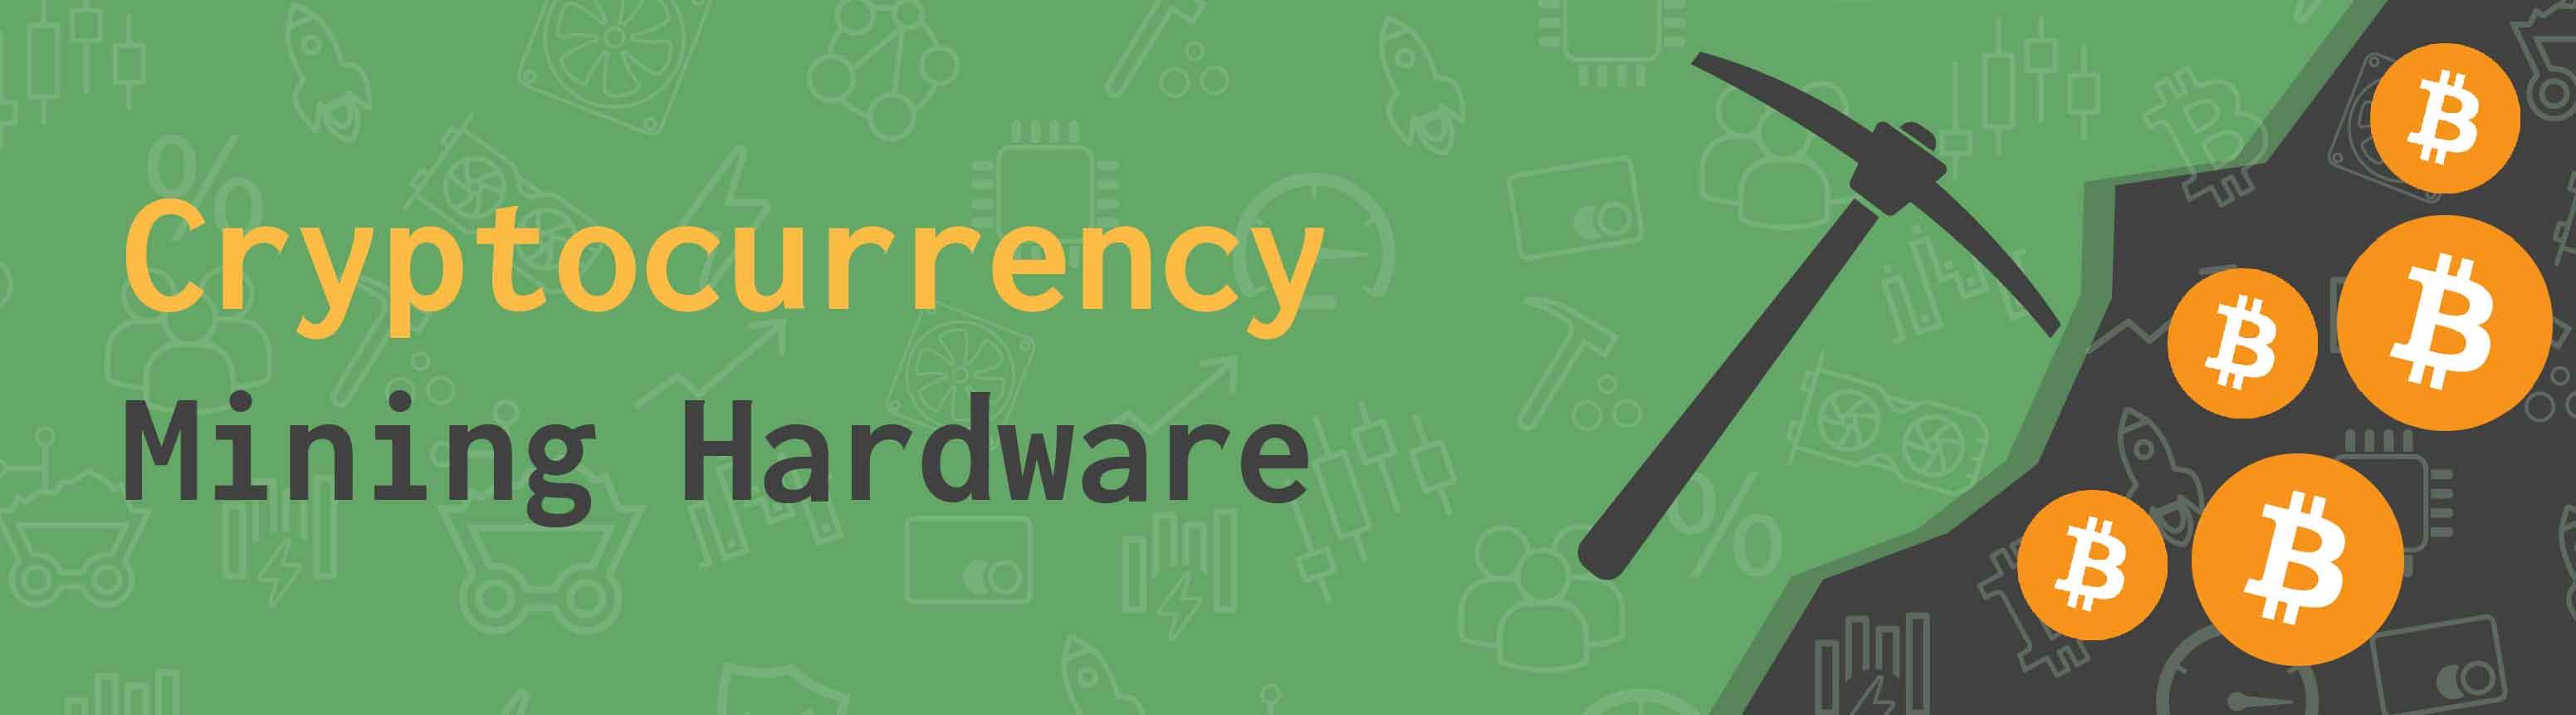 Best Cryptocurrency Mining Hardware CPUs, ASICs and GPUs (2019)